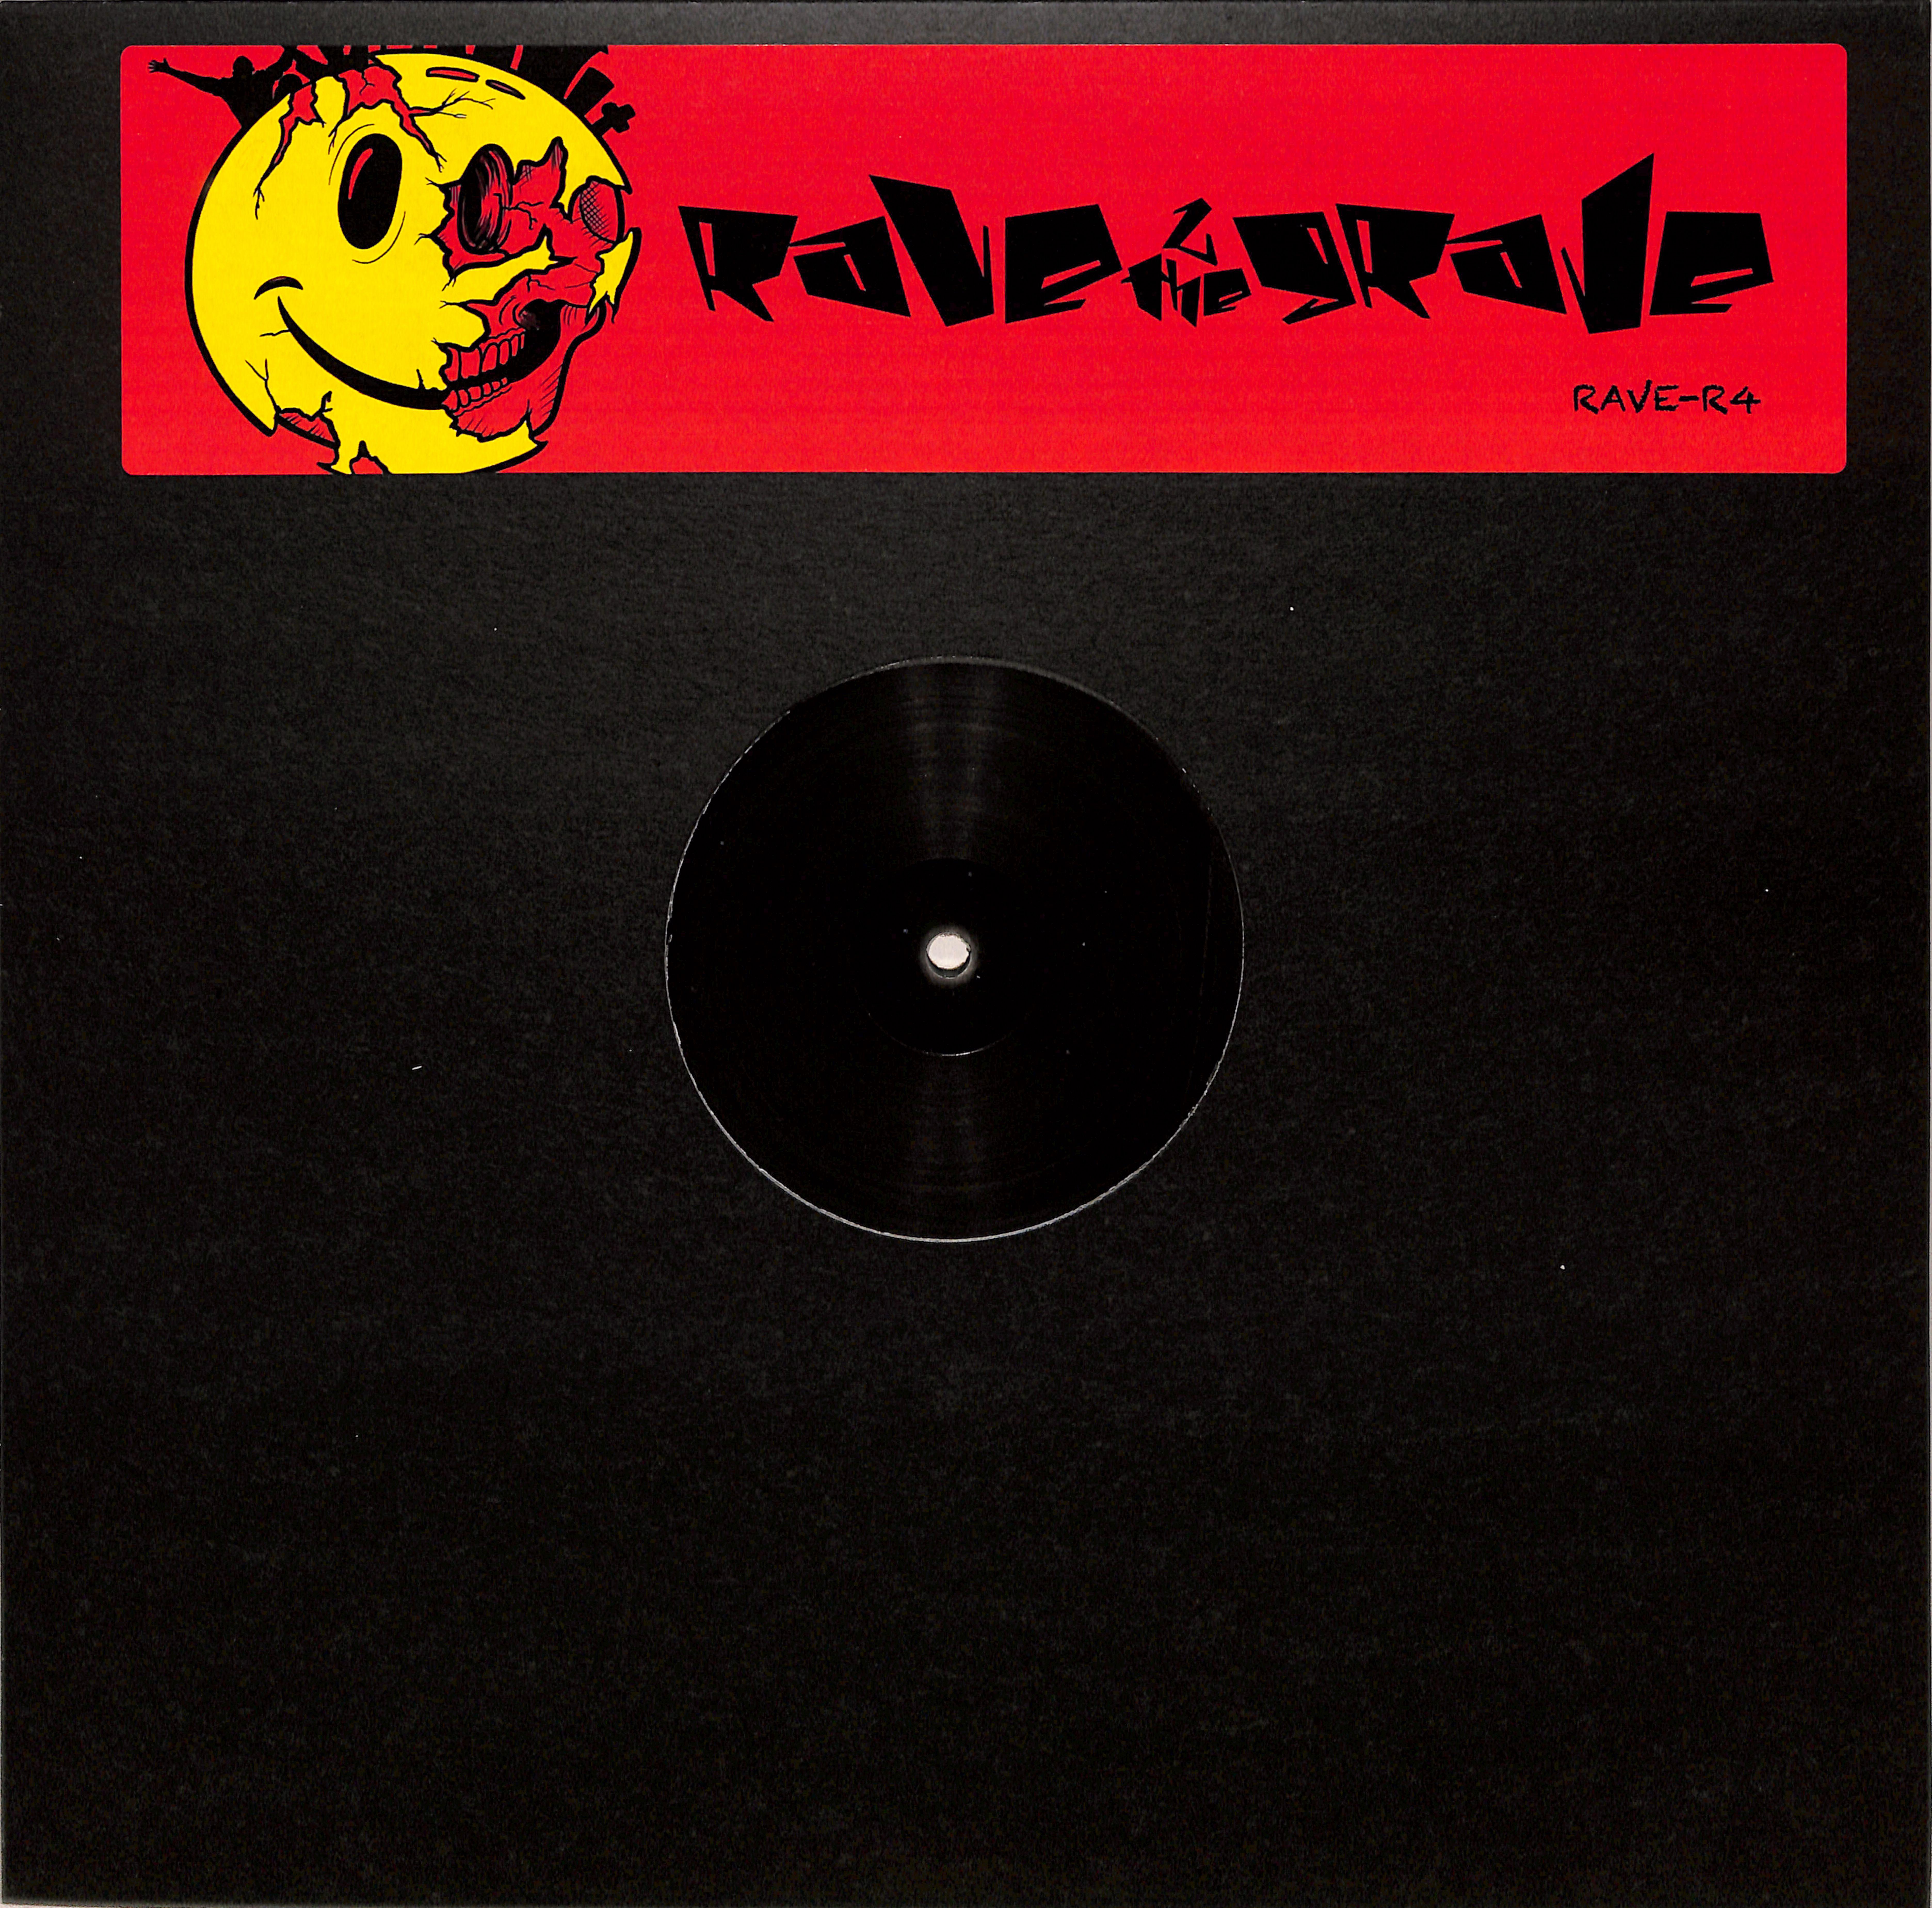 Rave 2 The Grave & Mice Electa - FAR OUT / CLOSER